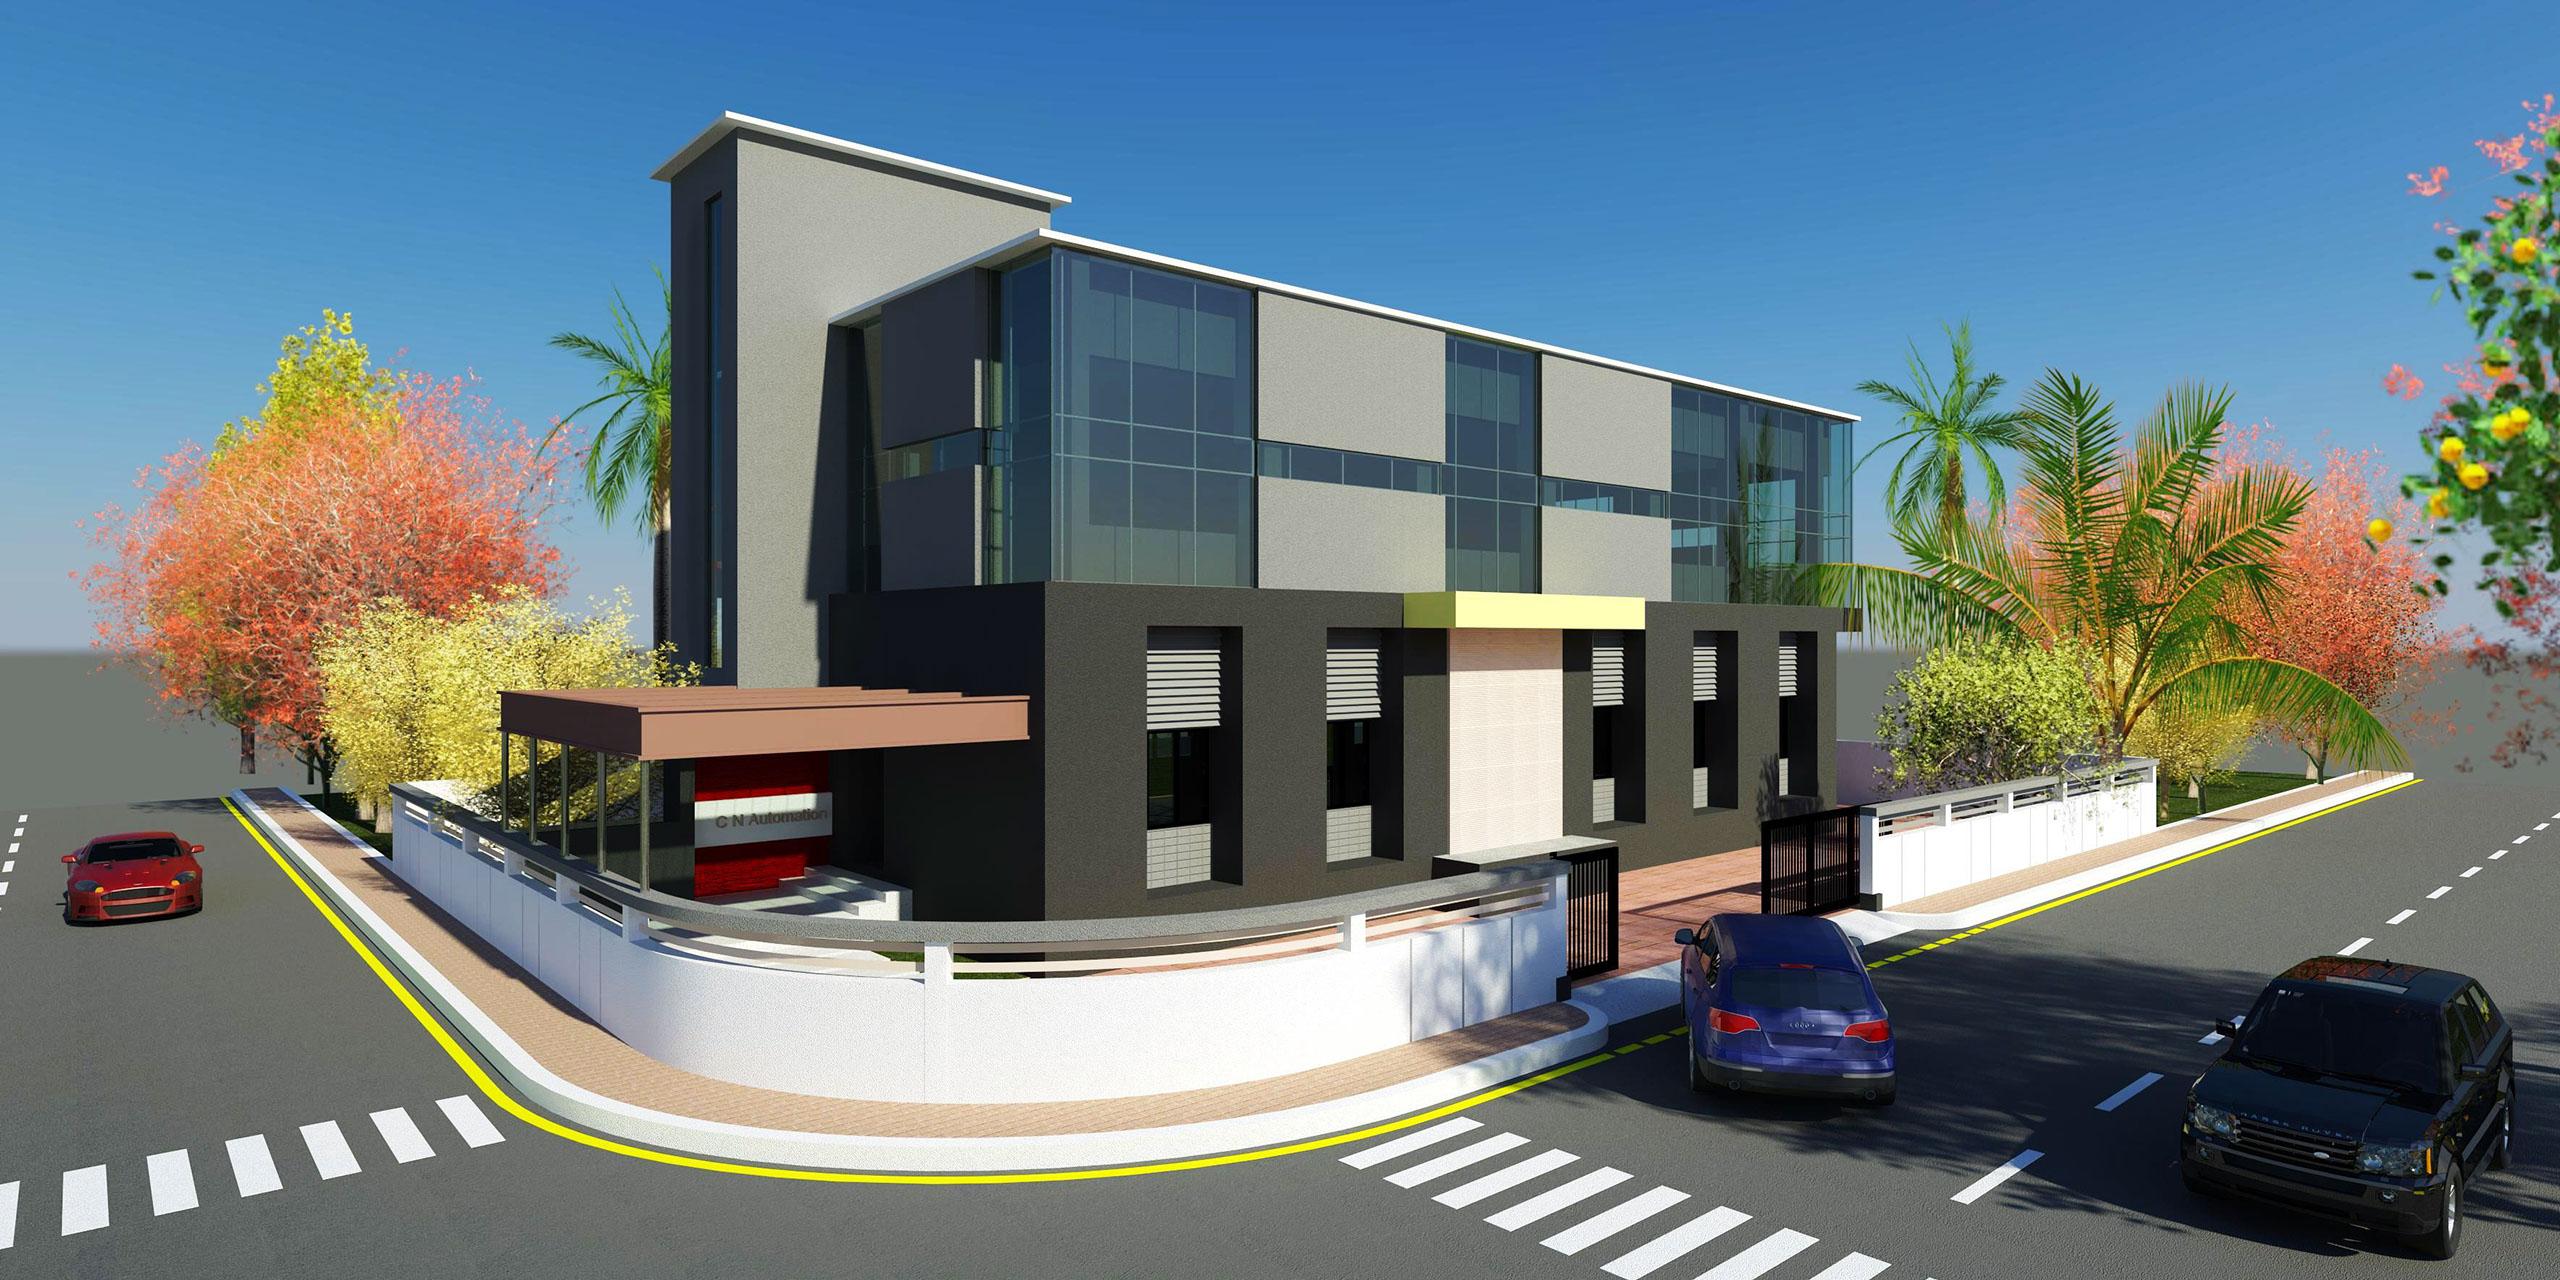 House design valuation - Architecture Planning Interior Design Engineering Valuation Landscape Design